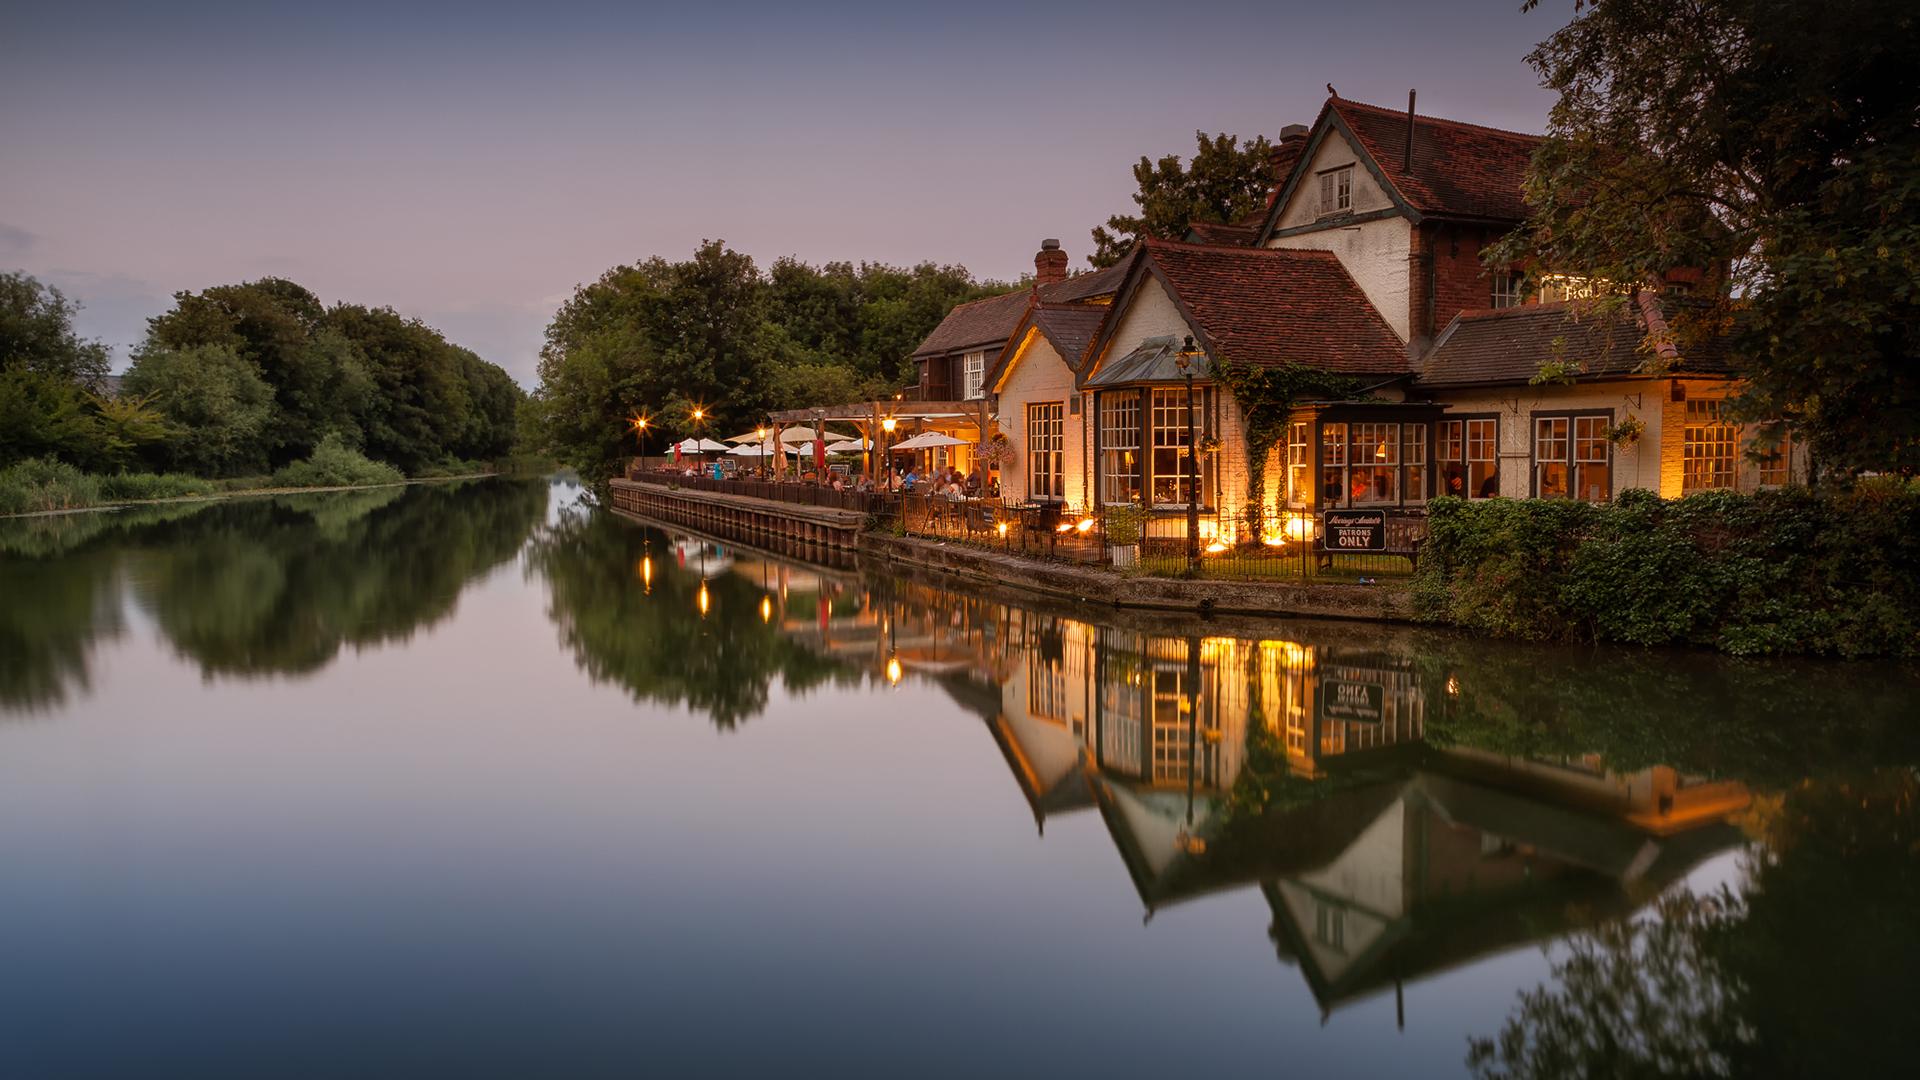 фотографии домик у реки они